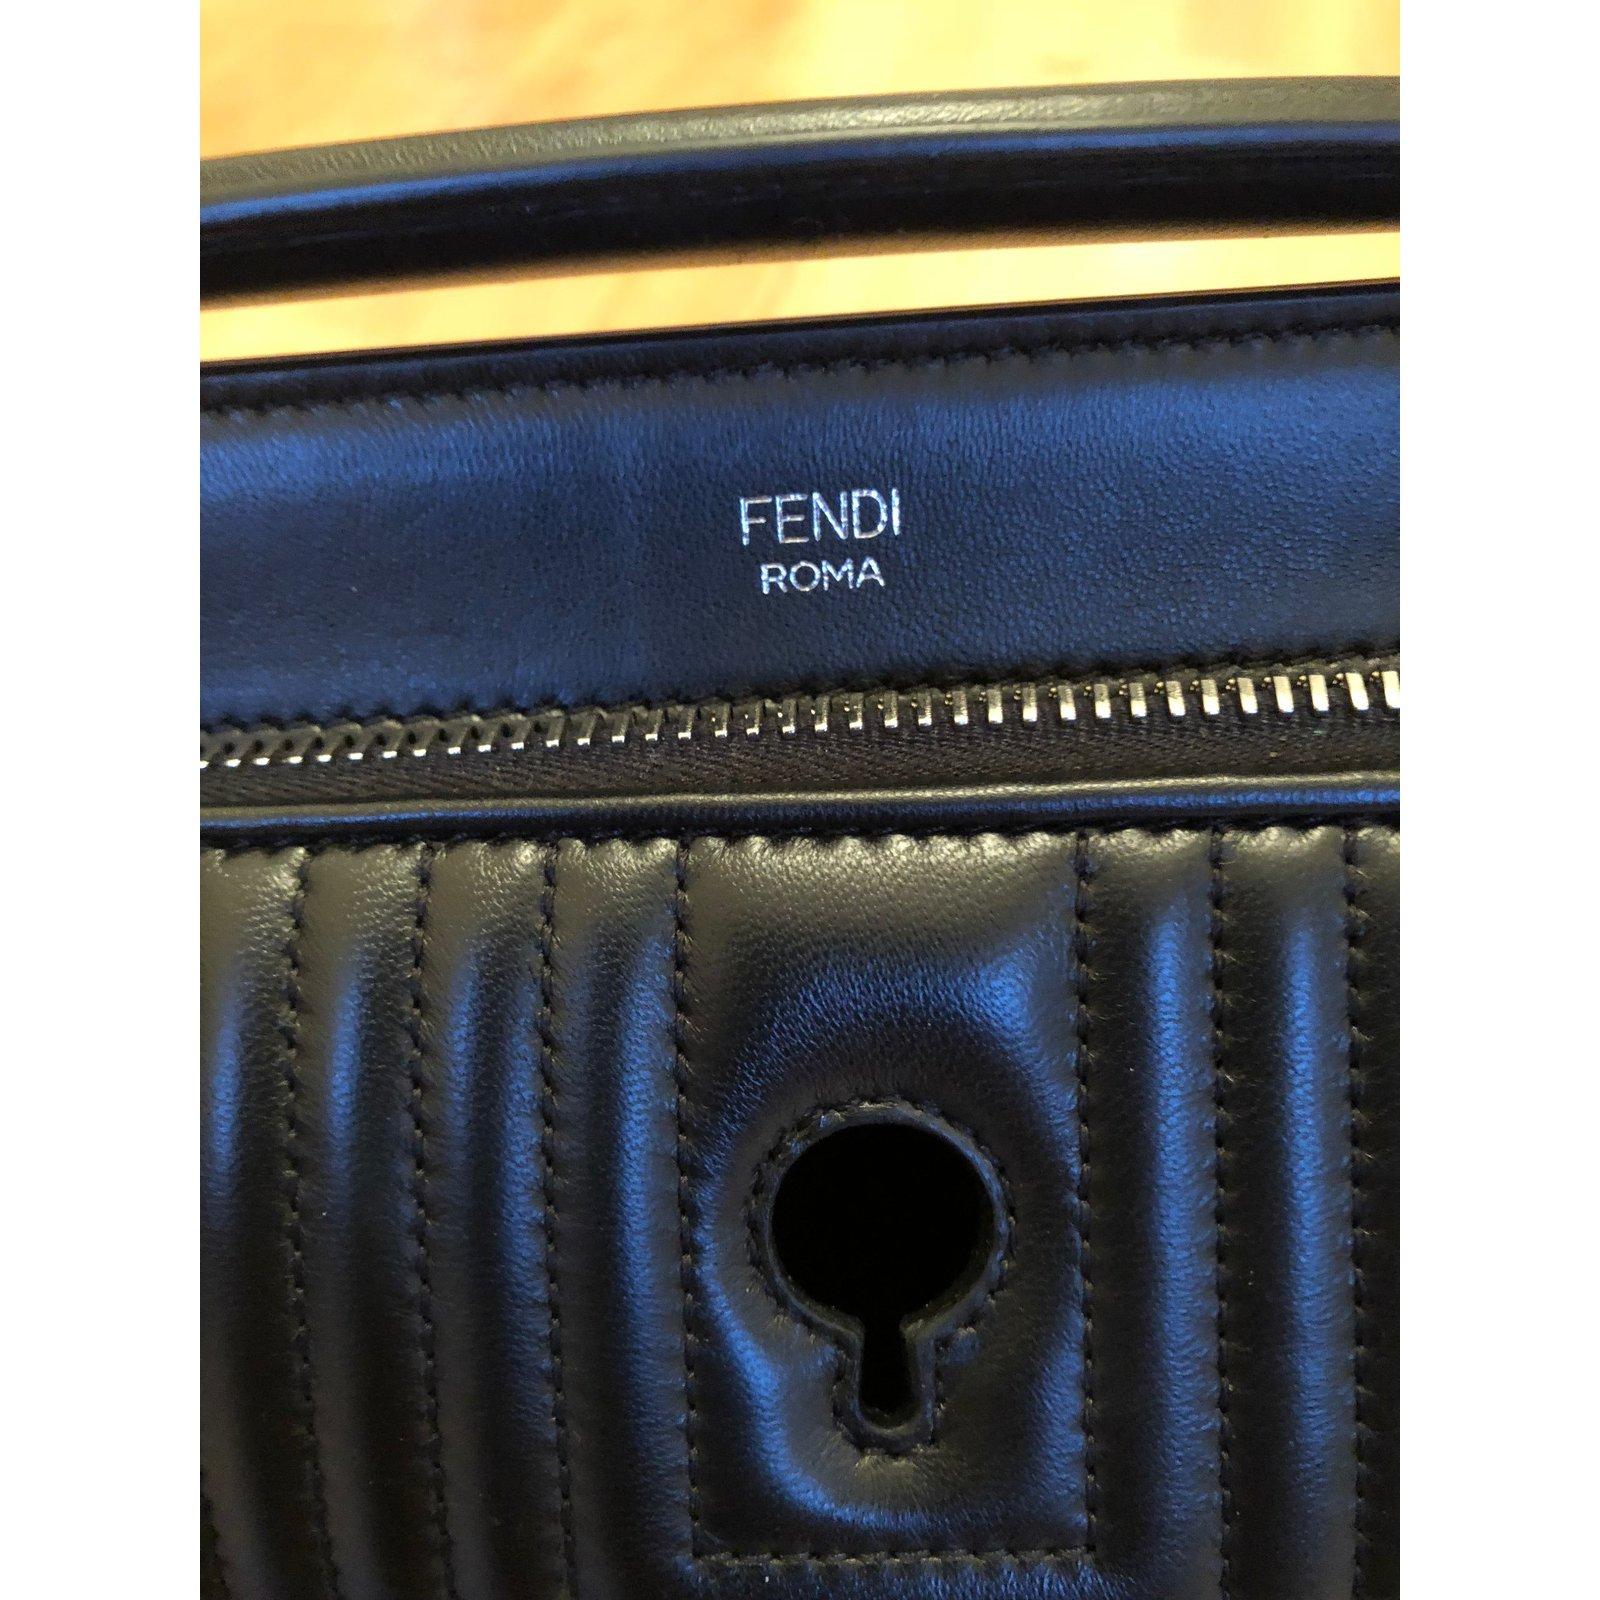 93b7166165 ... canada fendi fendi black matelasse leather dotcom click bag in new  condition handbags leather black ref ...